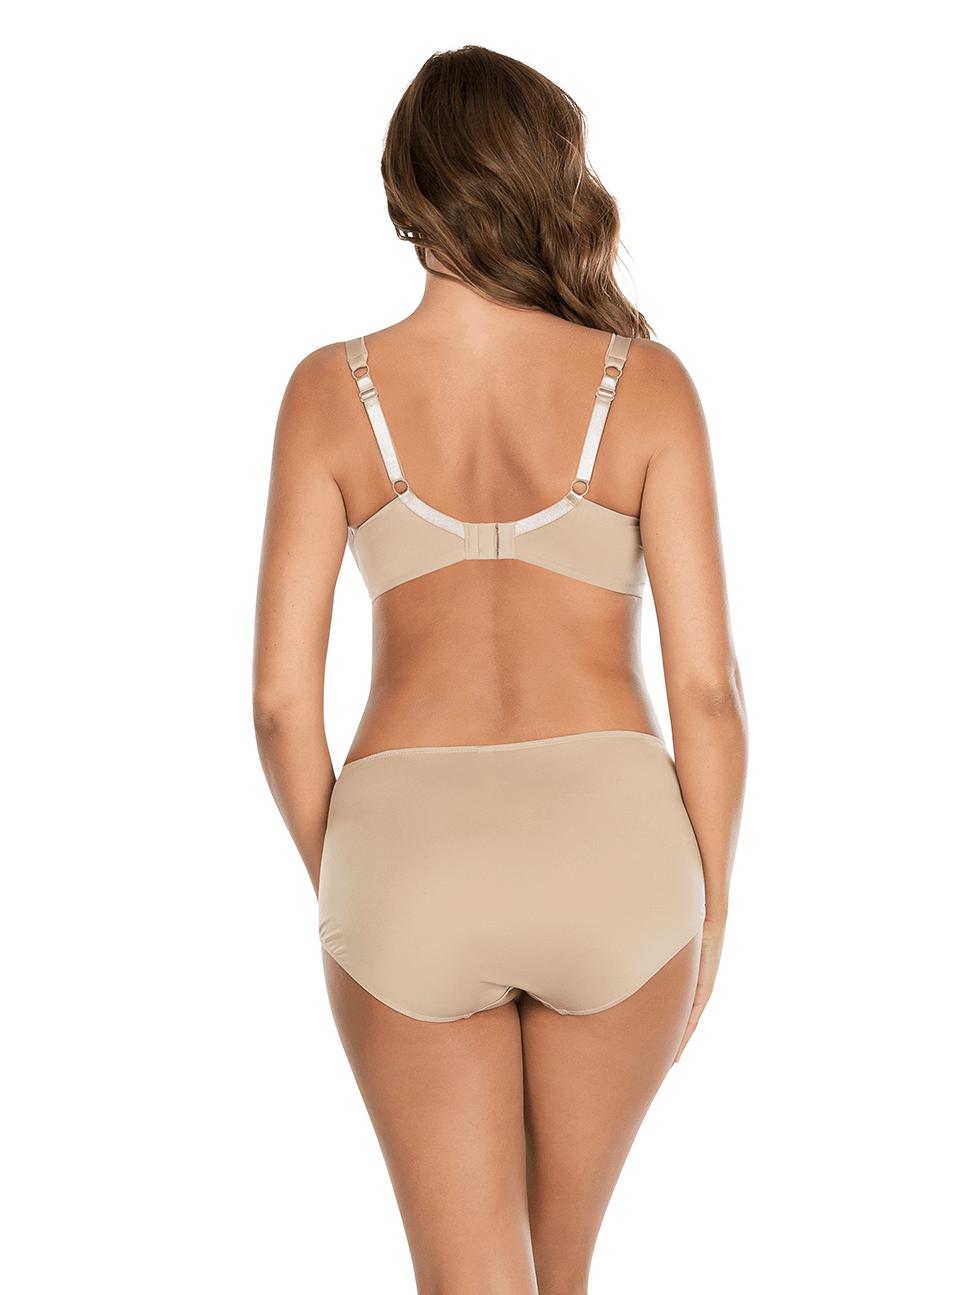 Jeanie TShirtBra4812 HighCutBrief4803 Back - Jeanie T-Shirt Bra European Nude 4812